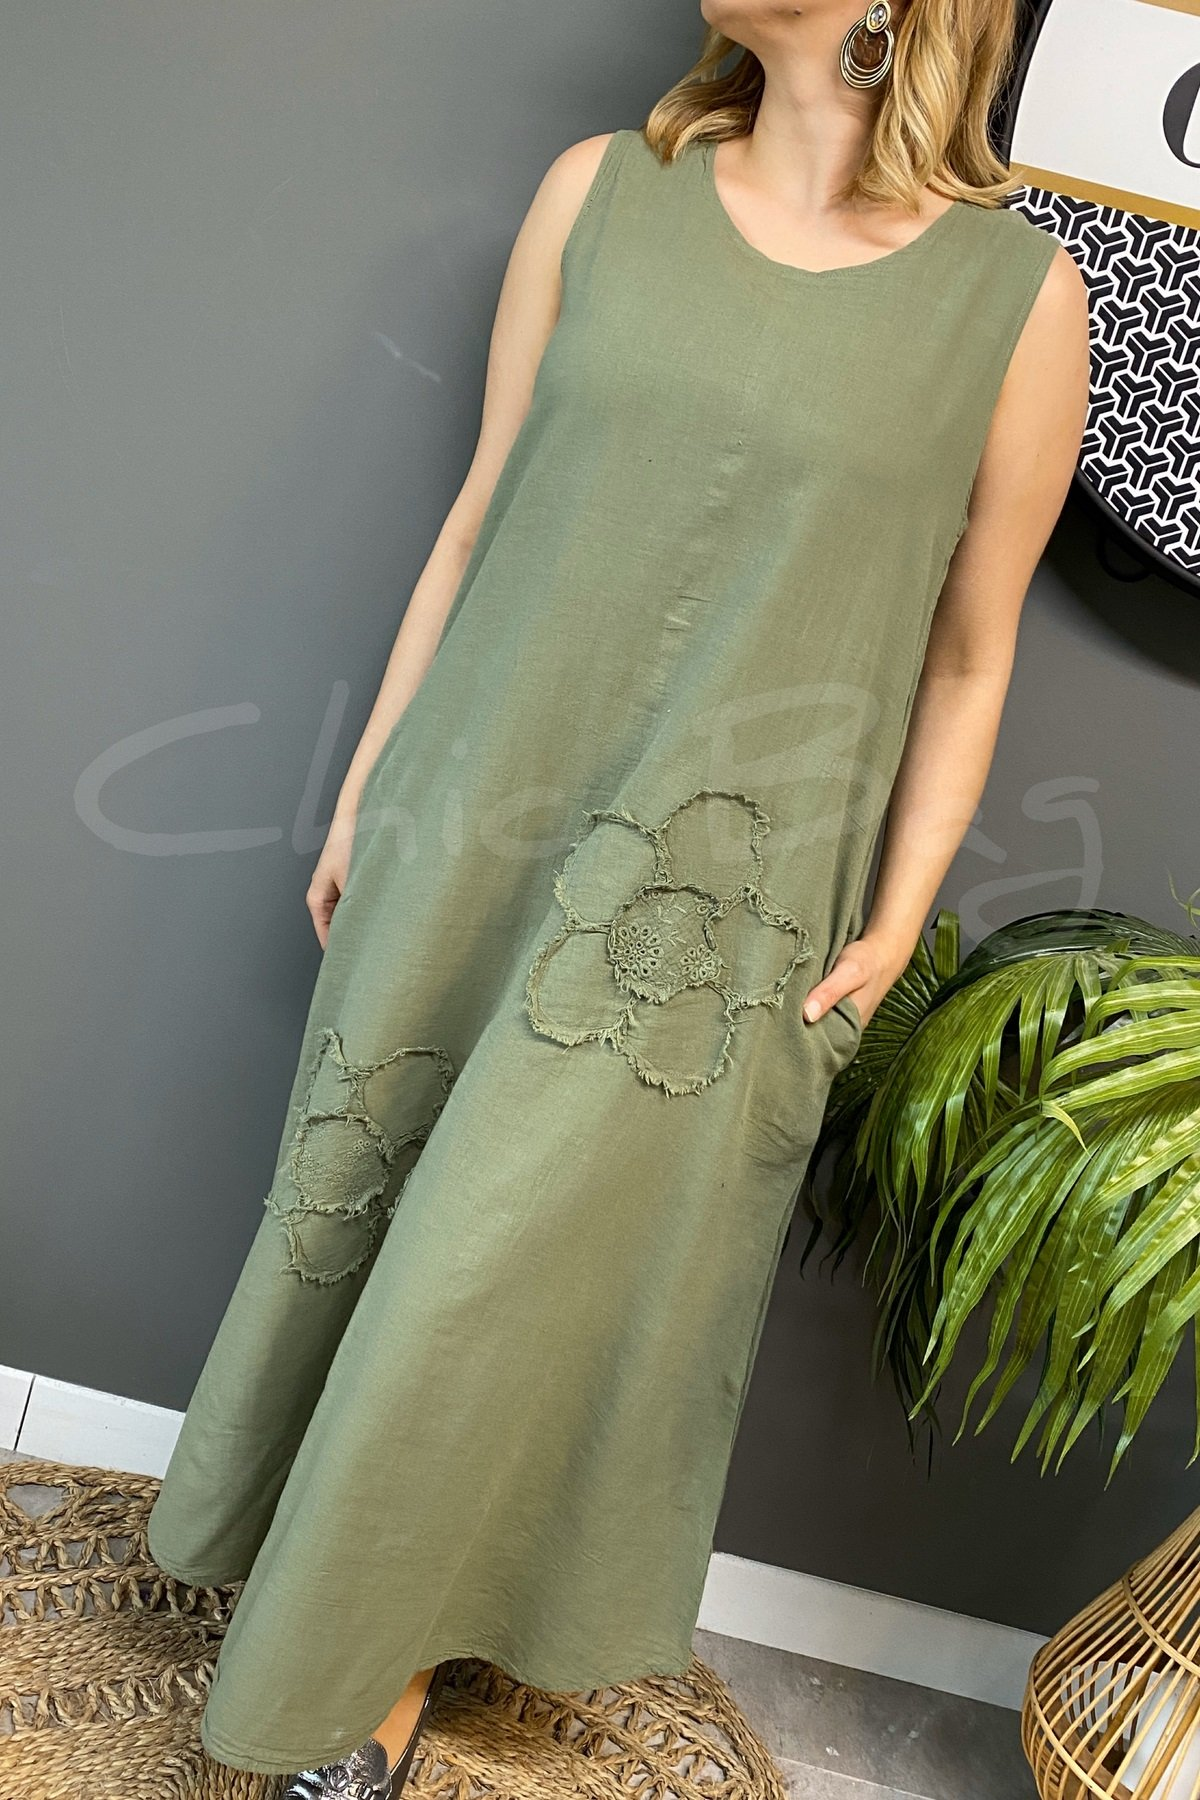 https://resim.chicbag.com.tr/p000757/hy/papatyali-kolsuz-etegi-oval-elbise-mltm-01e08247a0ee.